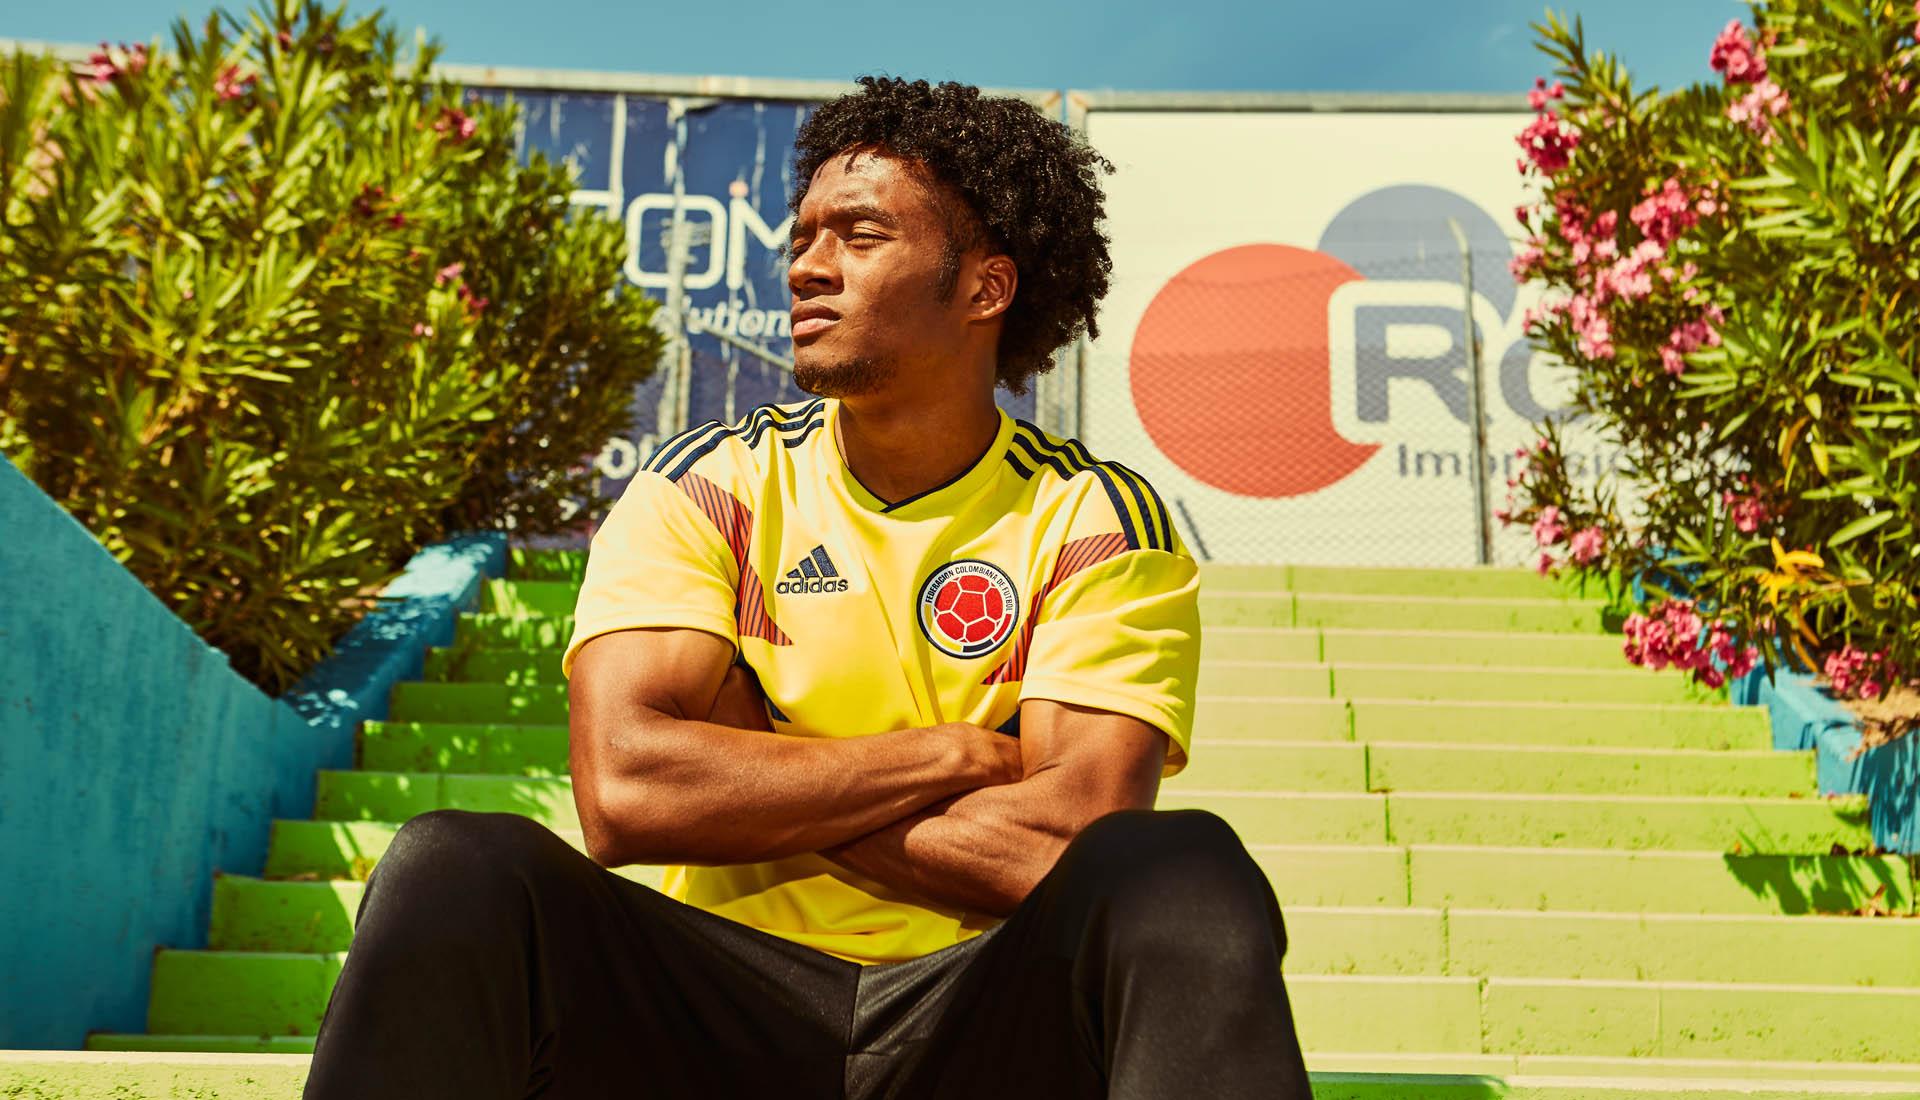 e0e05d2d7a1 Colombia World Cup Shirt 2018 adidas SoccerBible_0003_CUADRADO_12616.jpg